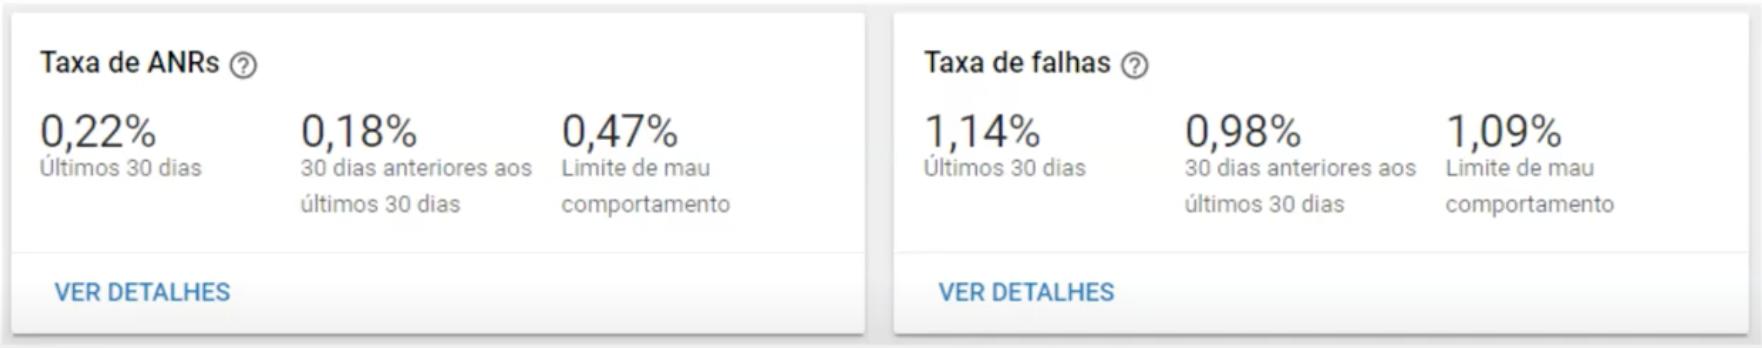 Taxa de ANRs